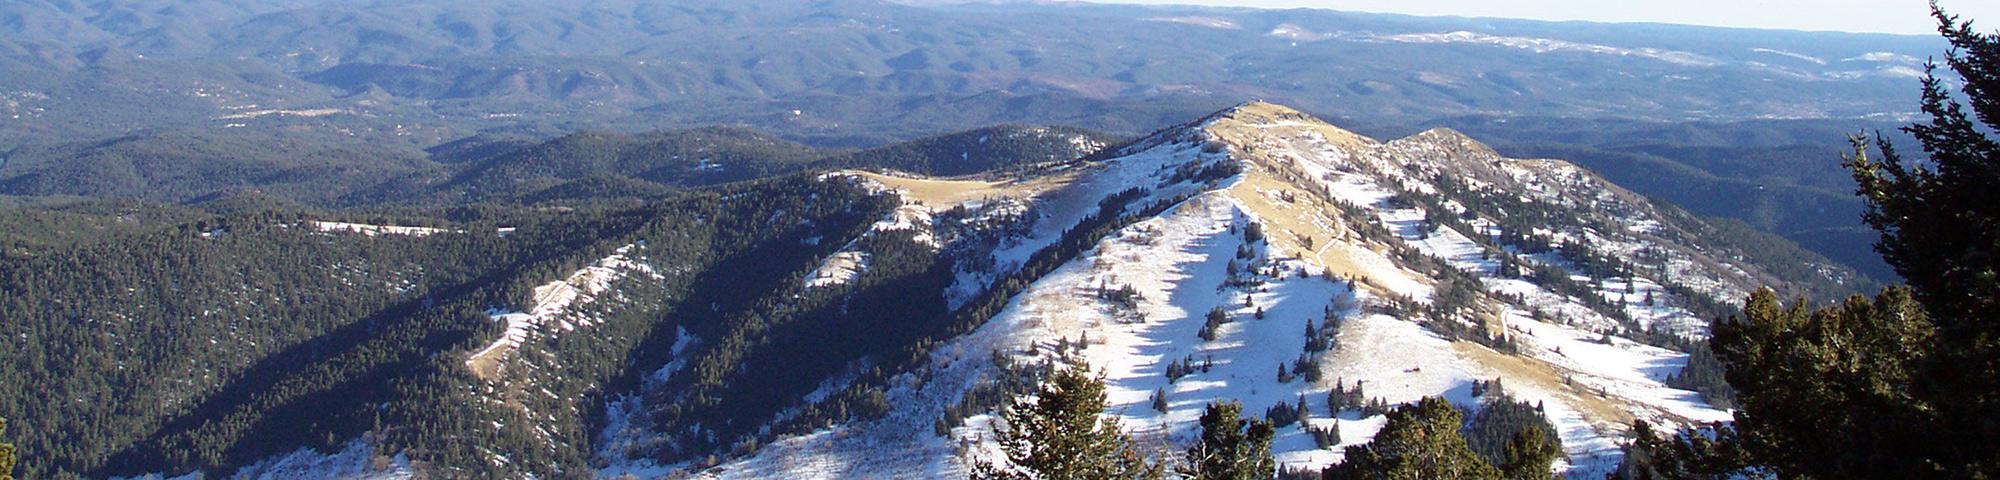 ski apache open & close dates - updated 2018/19 - snowpak